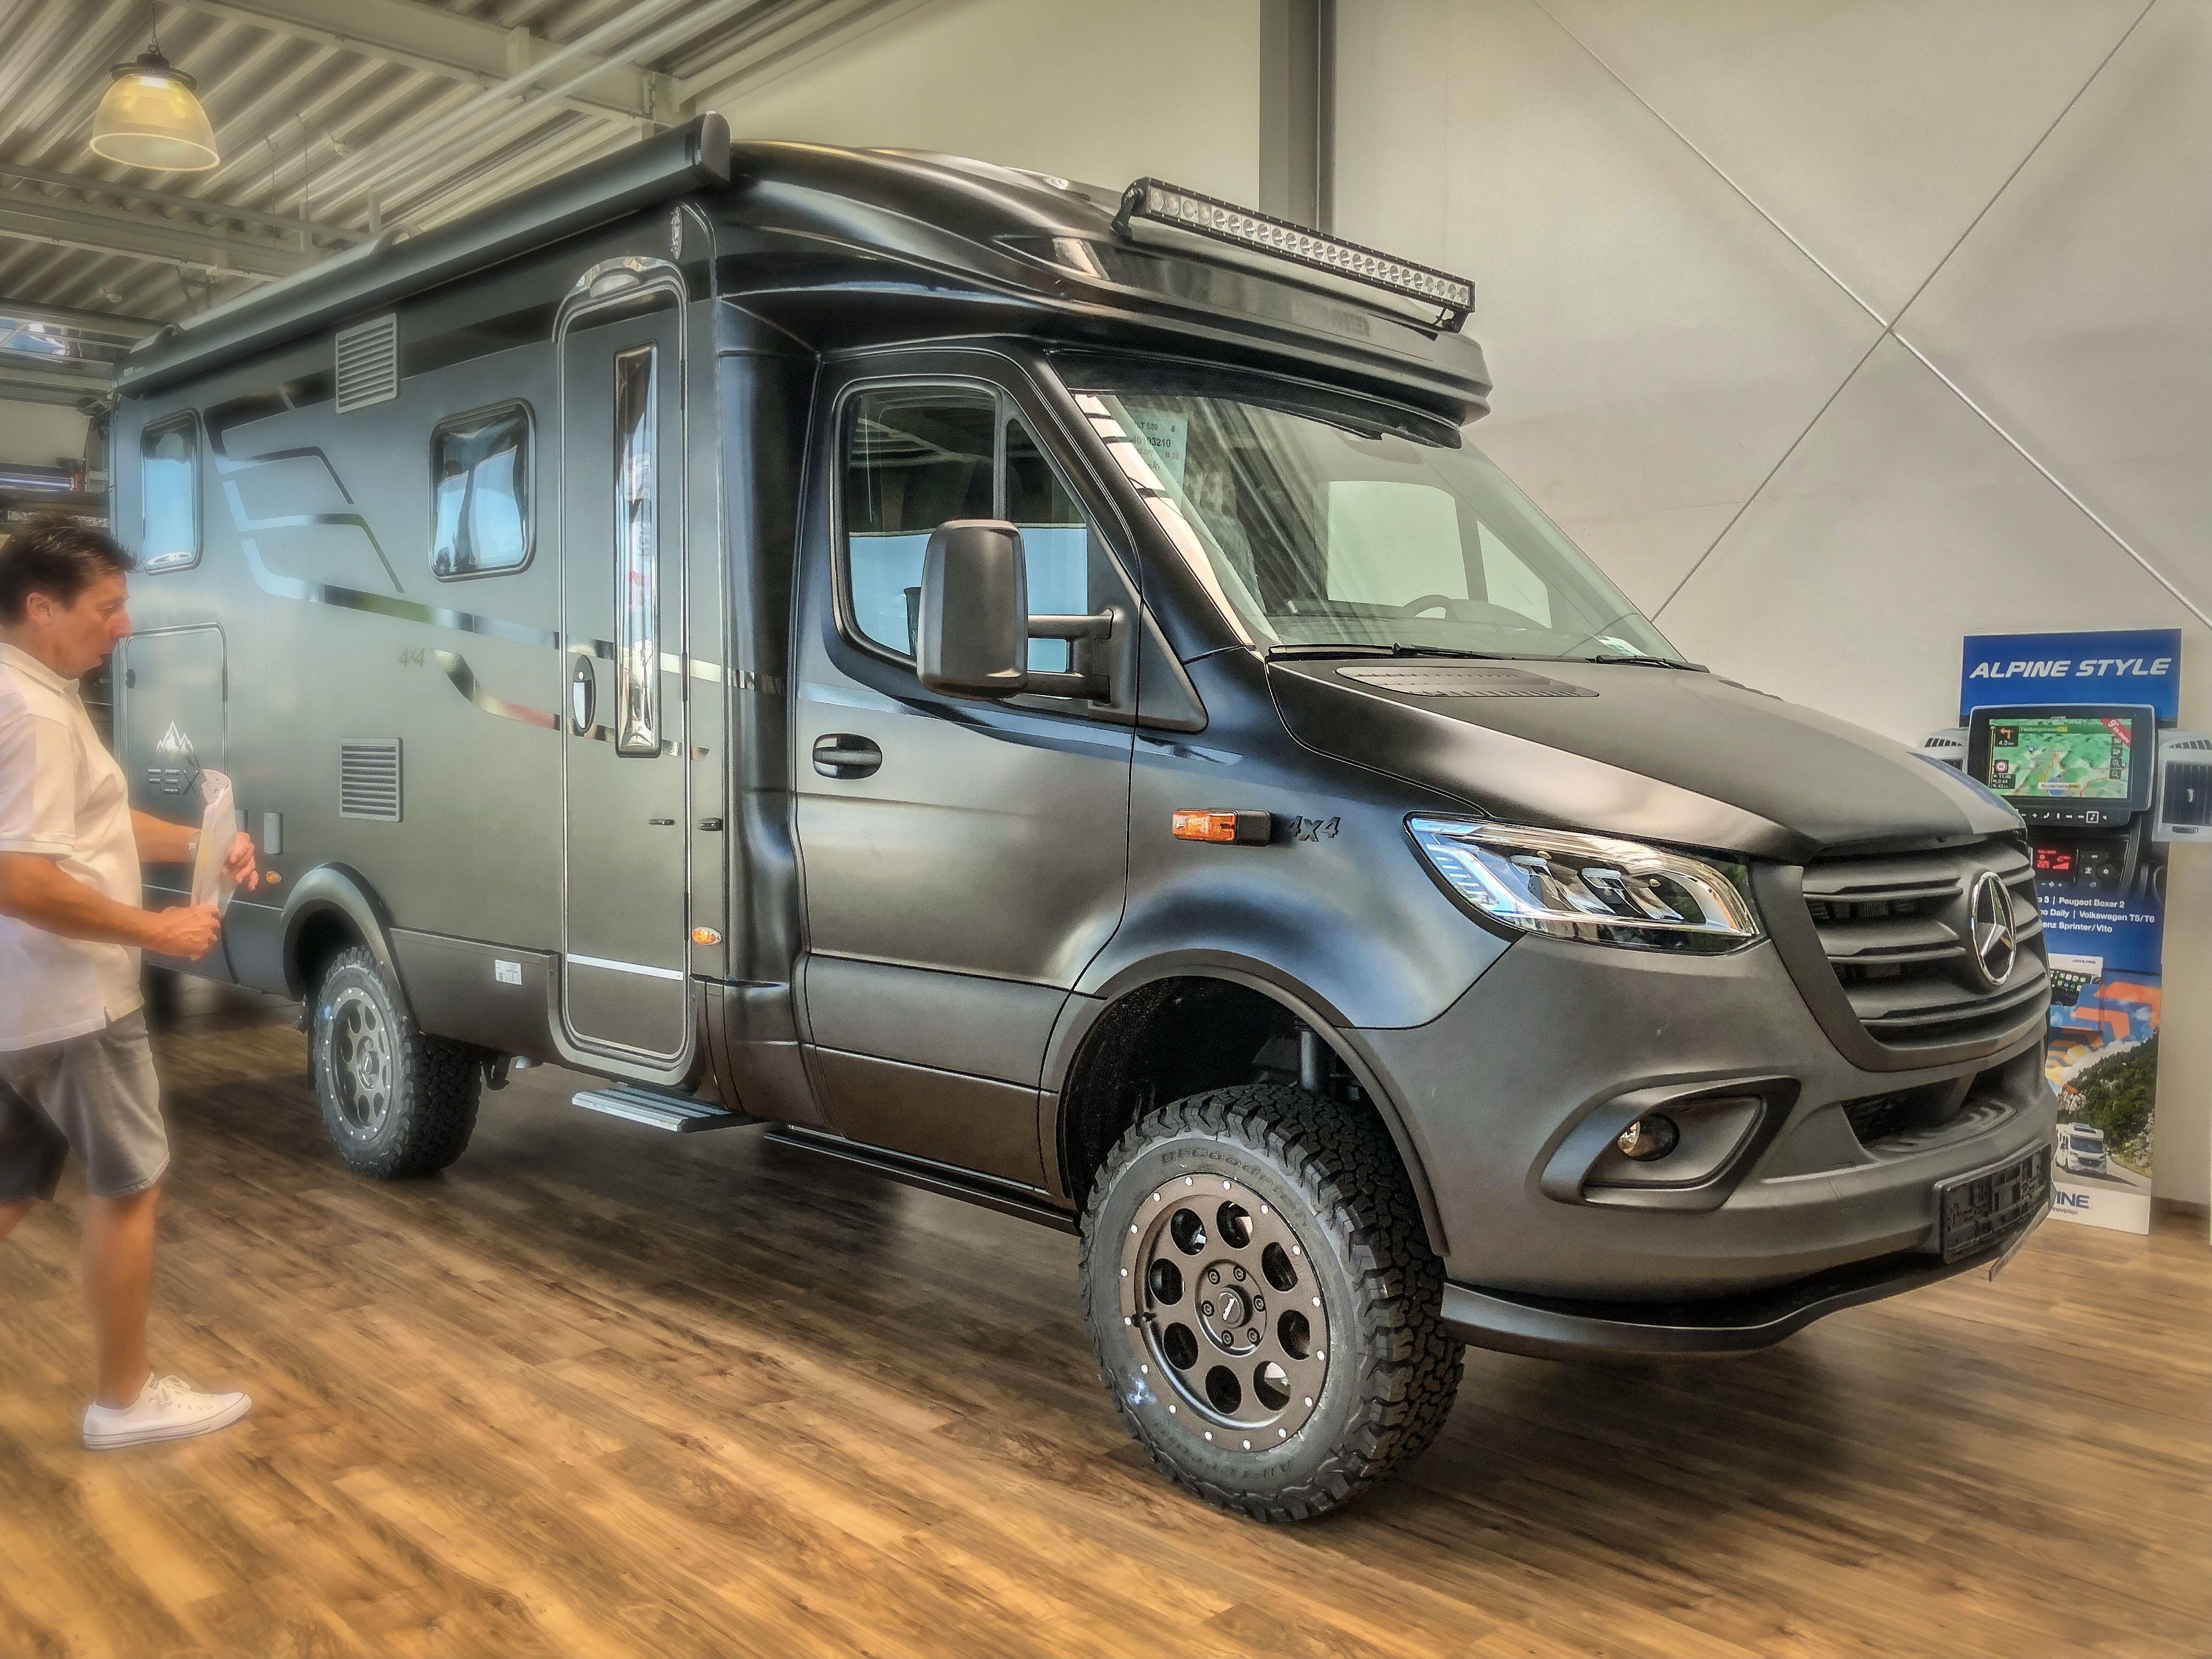 Black-Matte-Edition  10x10 wohnmobil, Allrad wohnmobil, Offroad